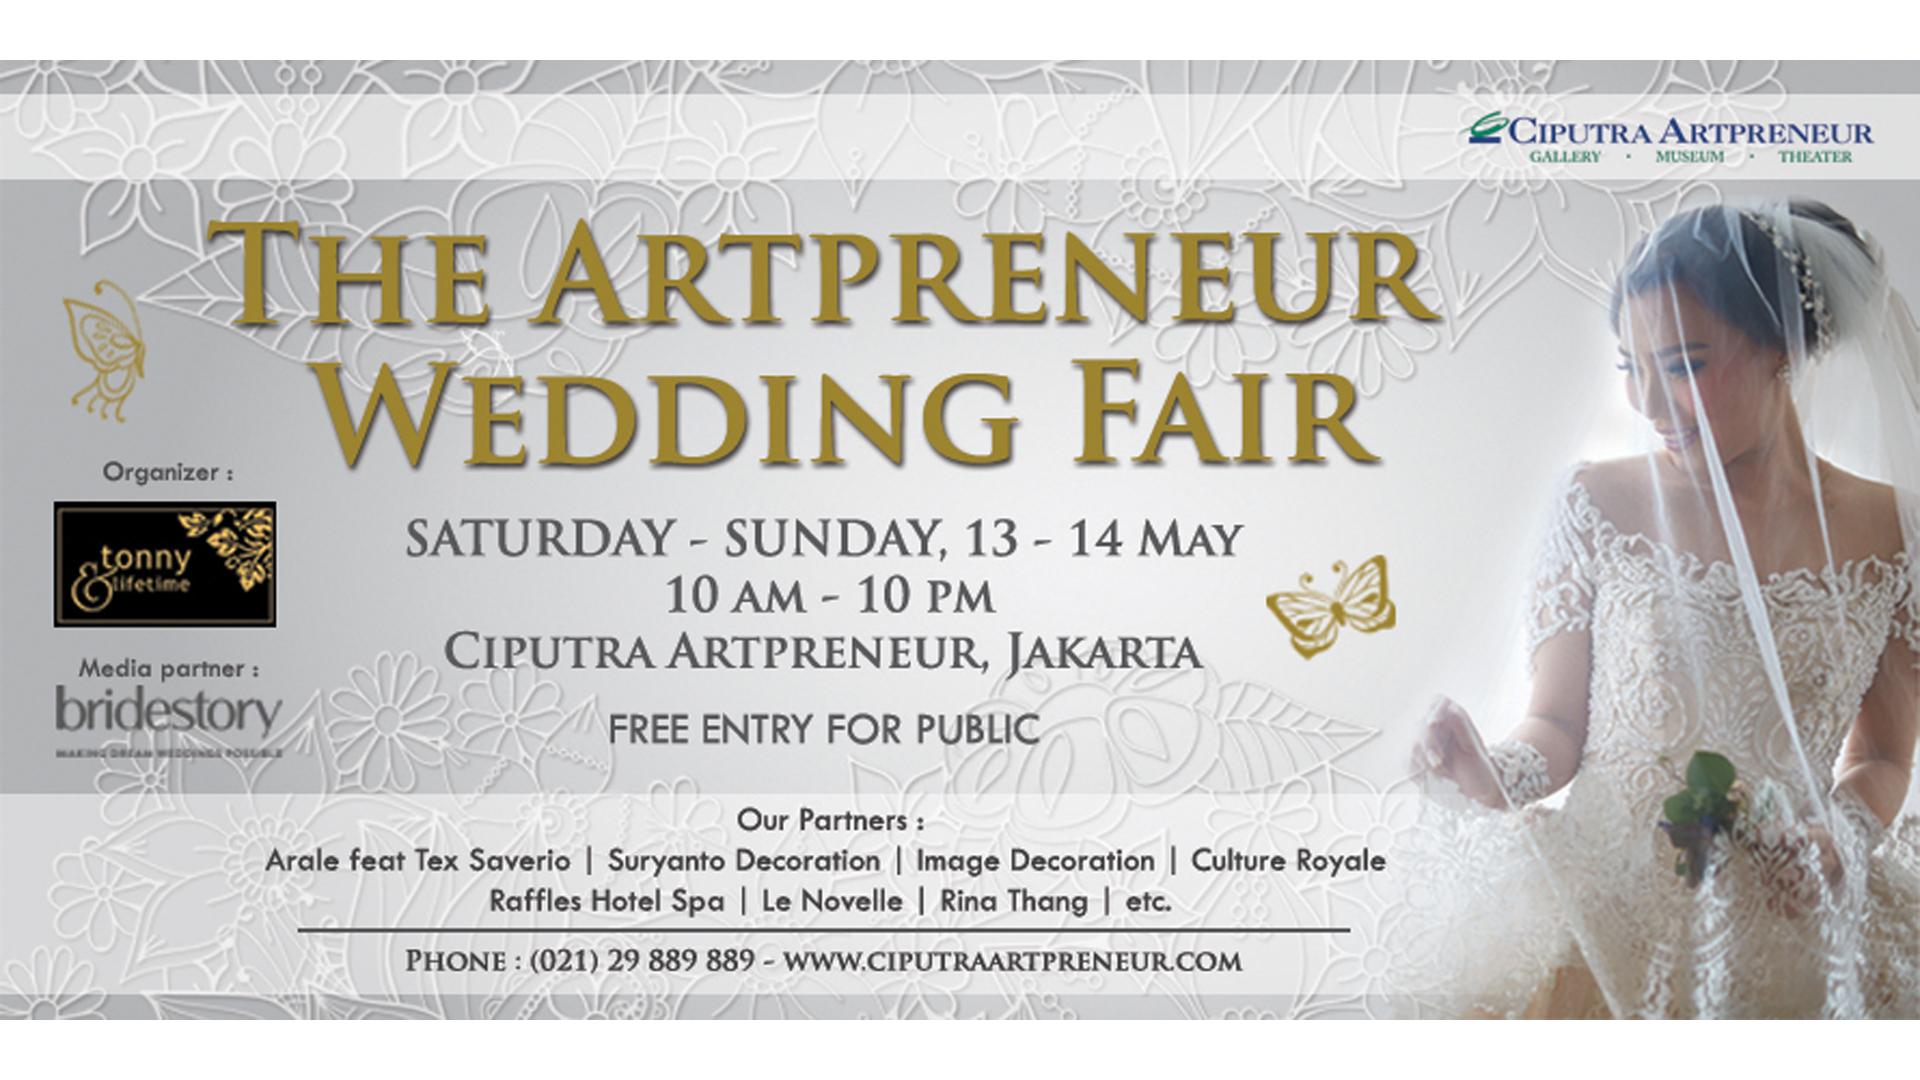 The Artpreneur Wedding Fair